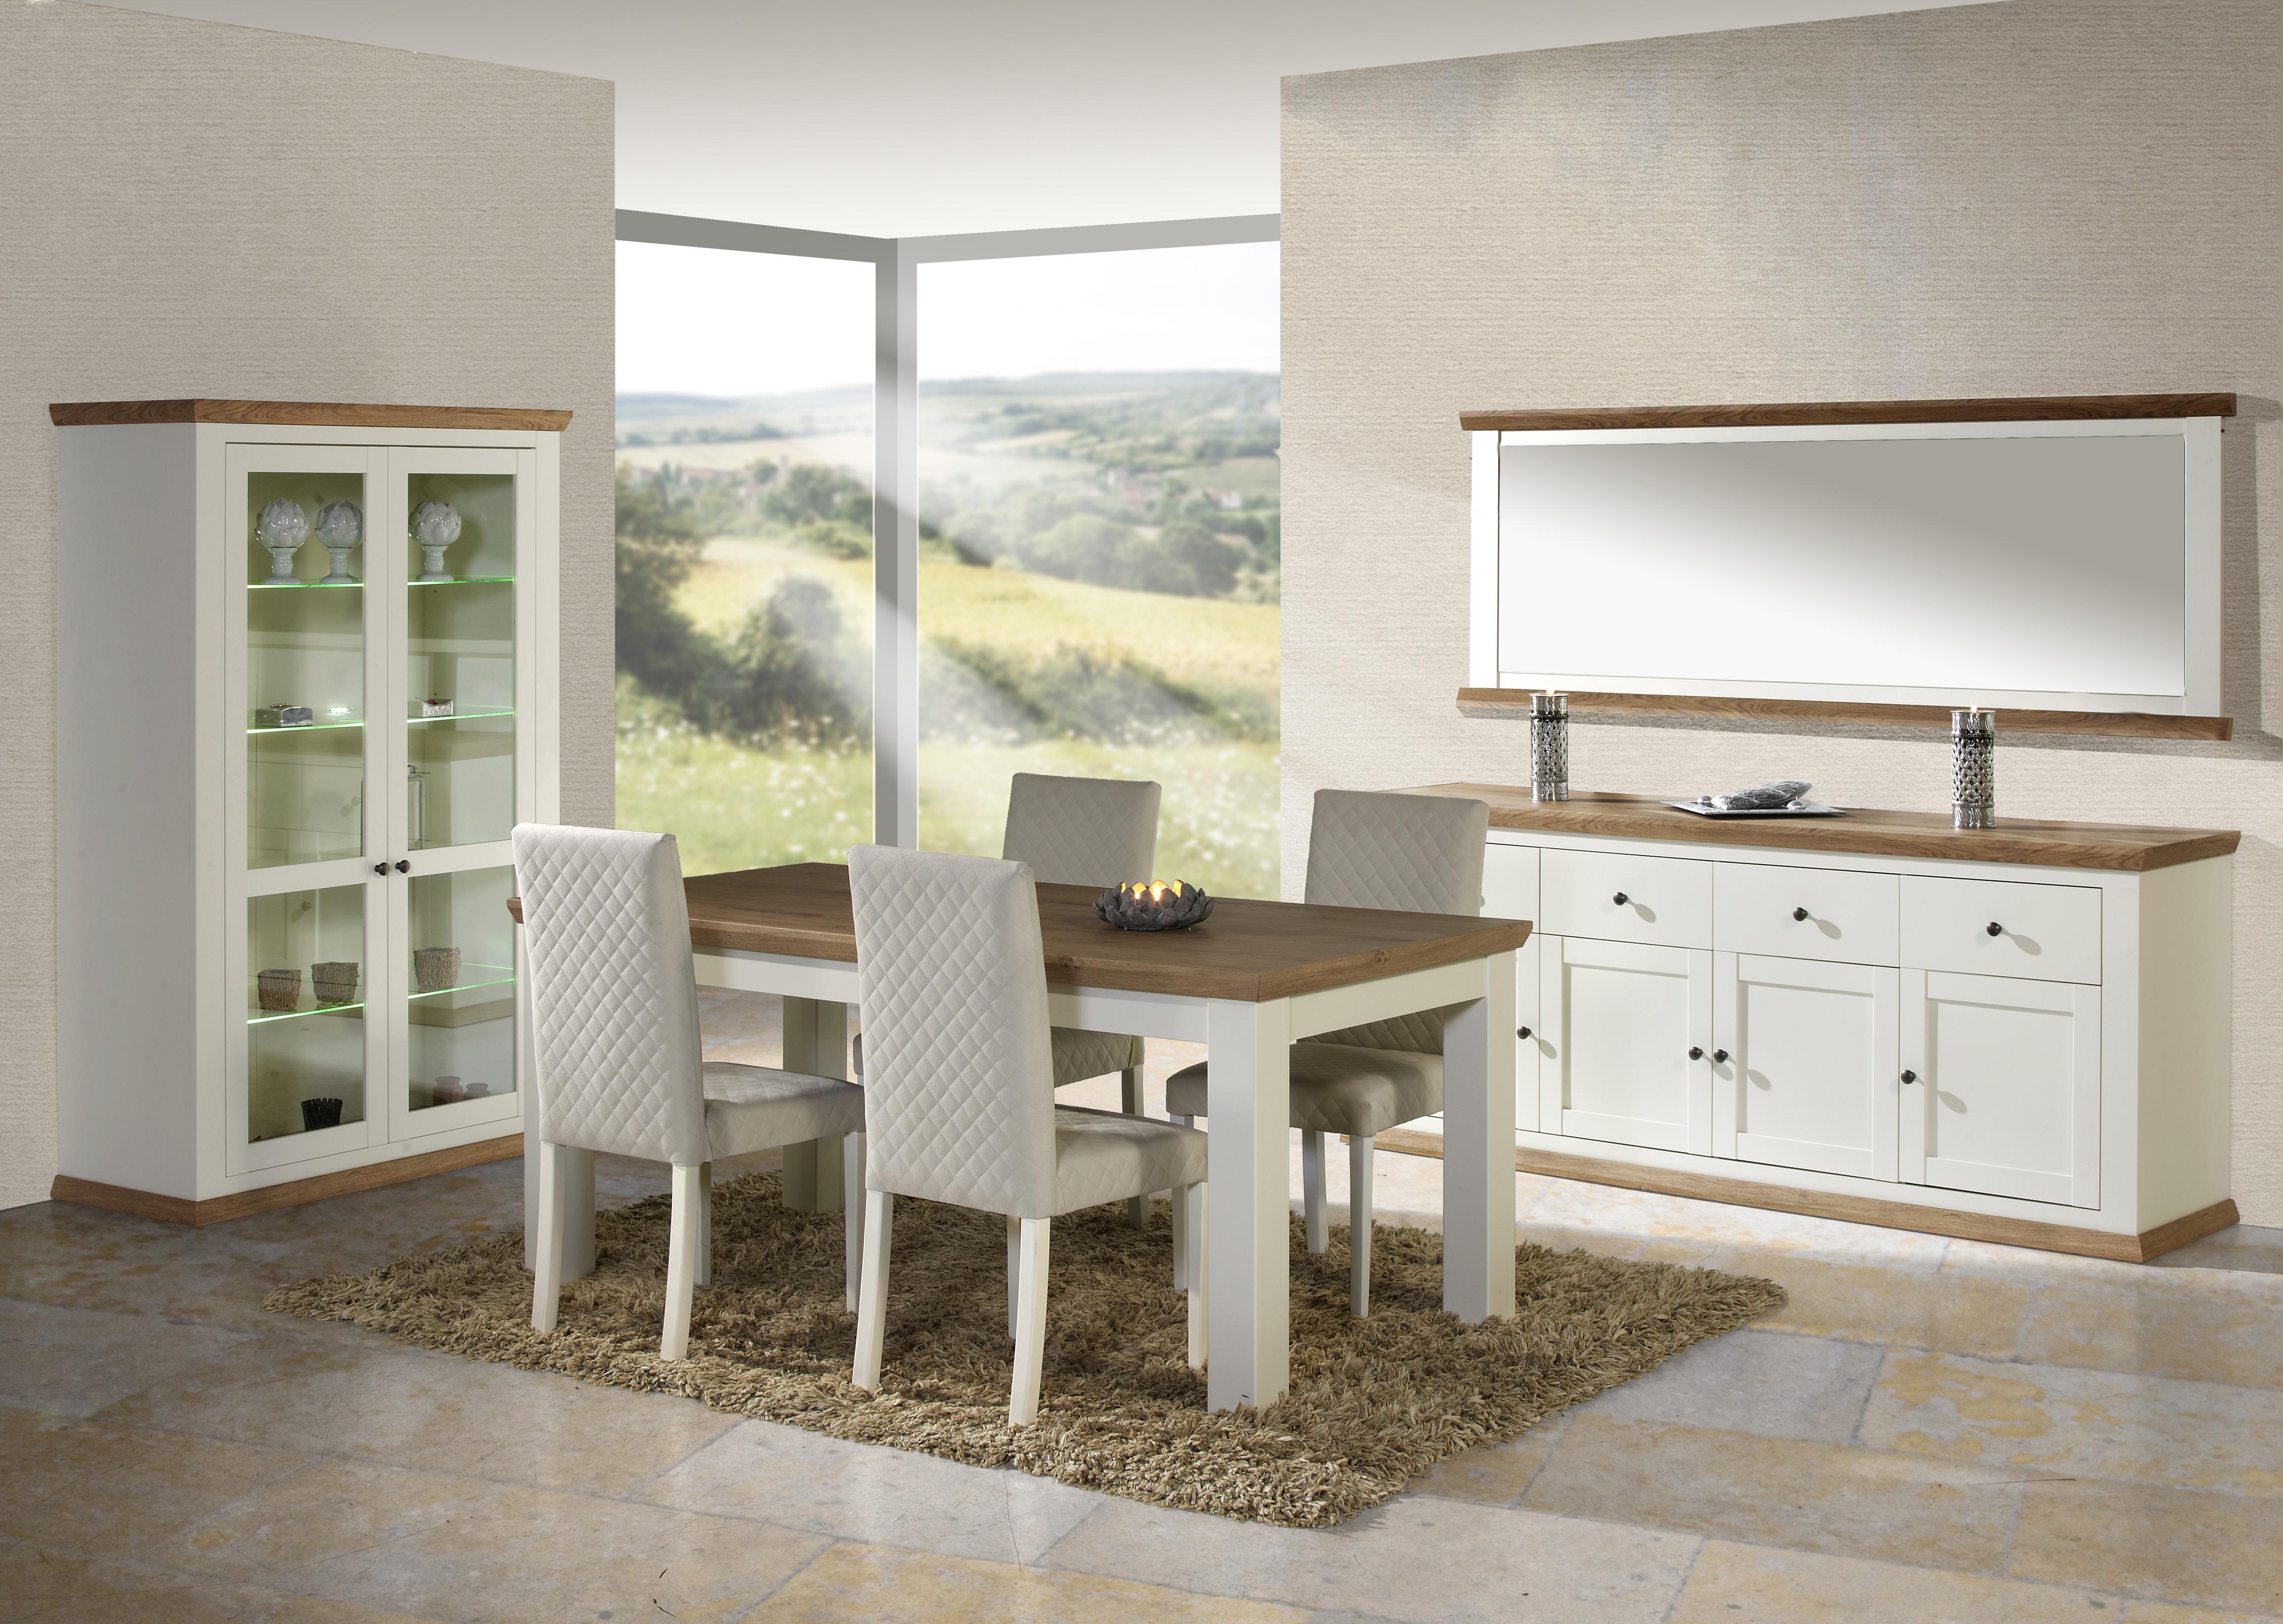 salle manger boston nkl meuble wassa et deco. Black Bedroom Furniture Sets. Home Design Ideas